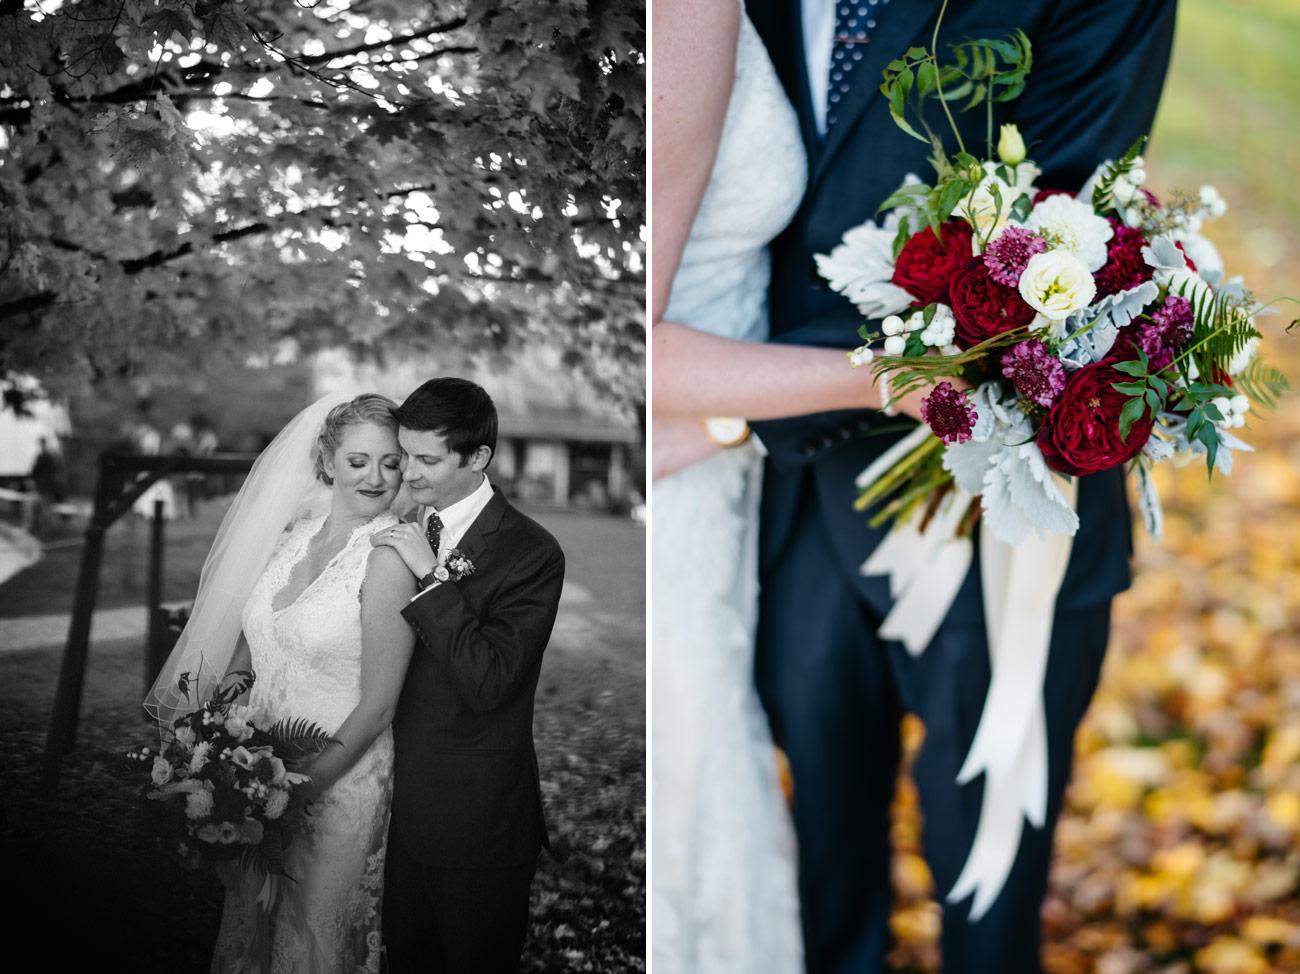 bishop_farm_wedding_photography_33.JPG